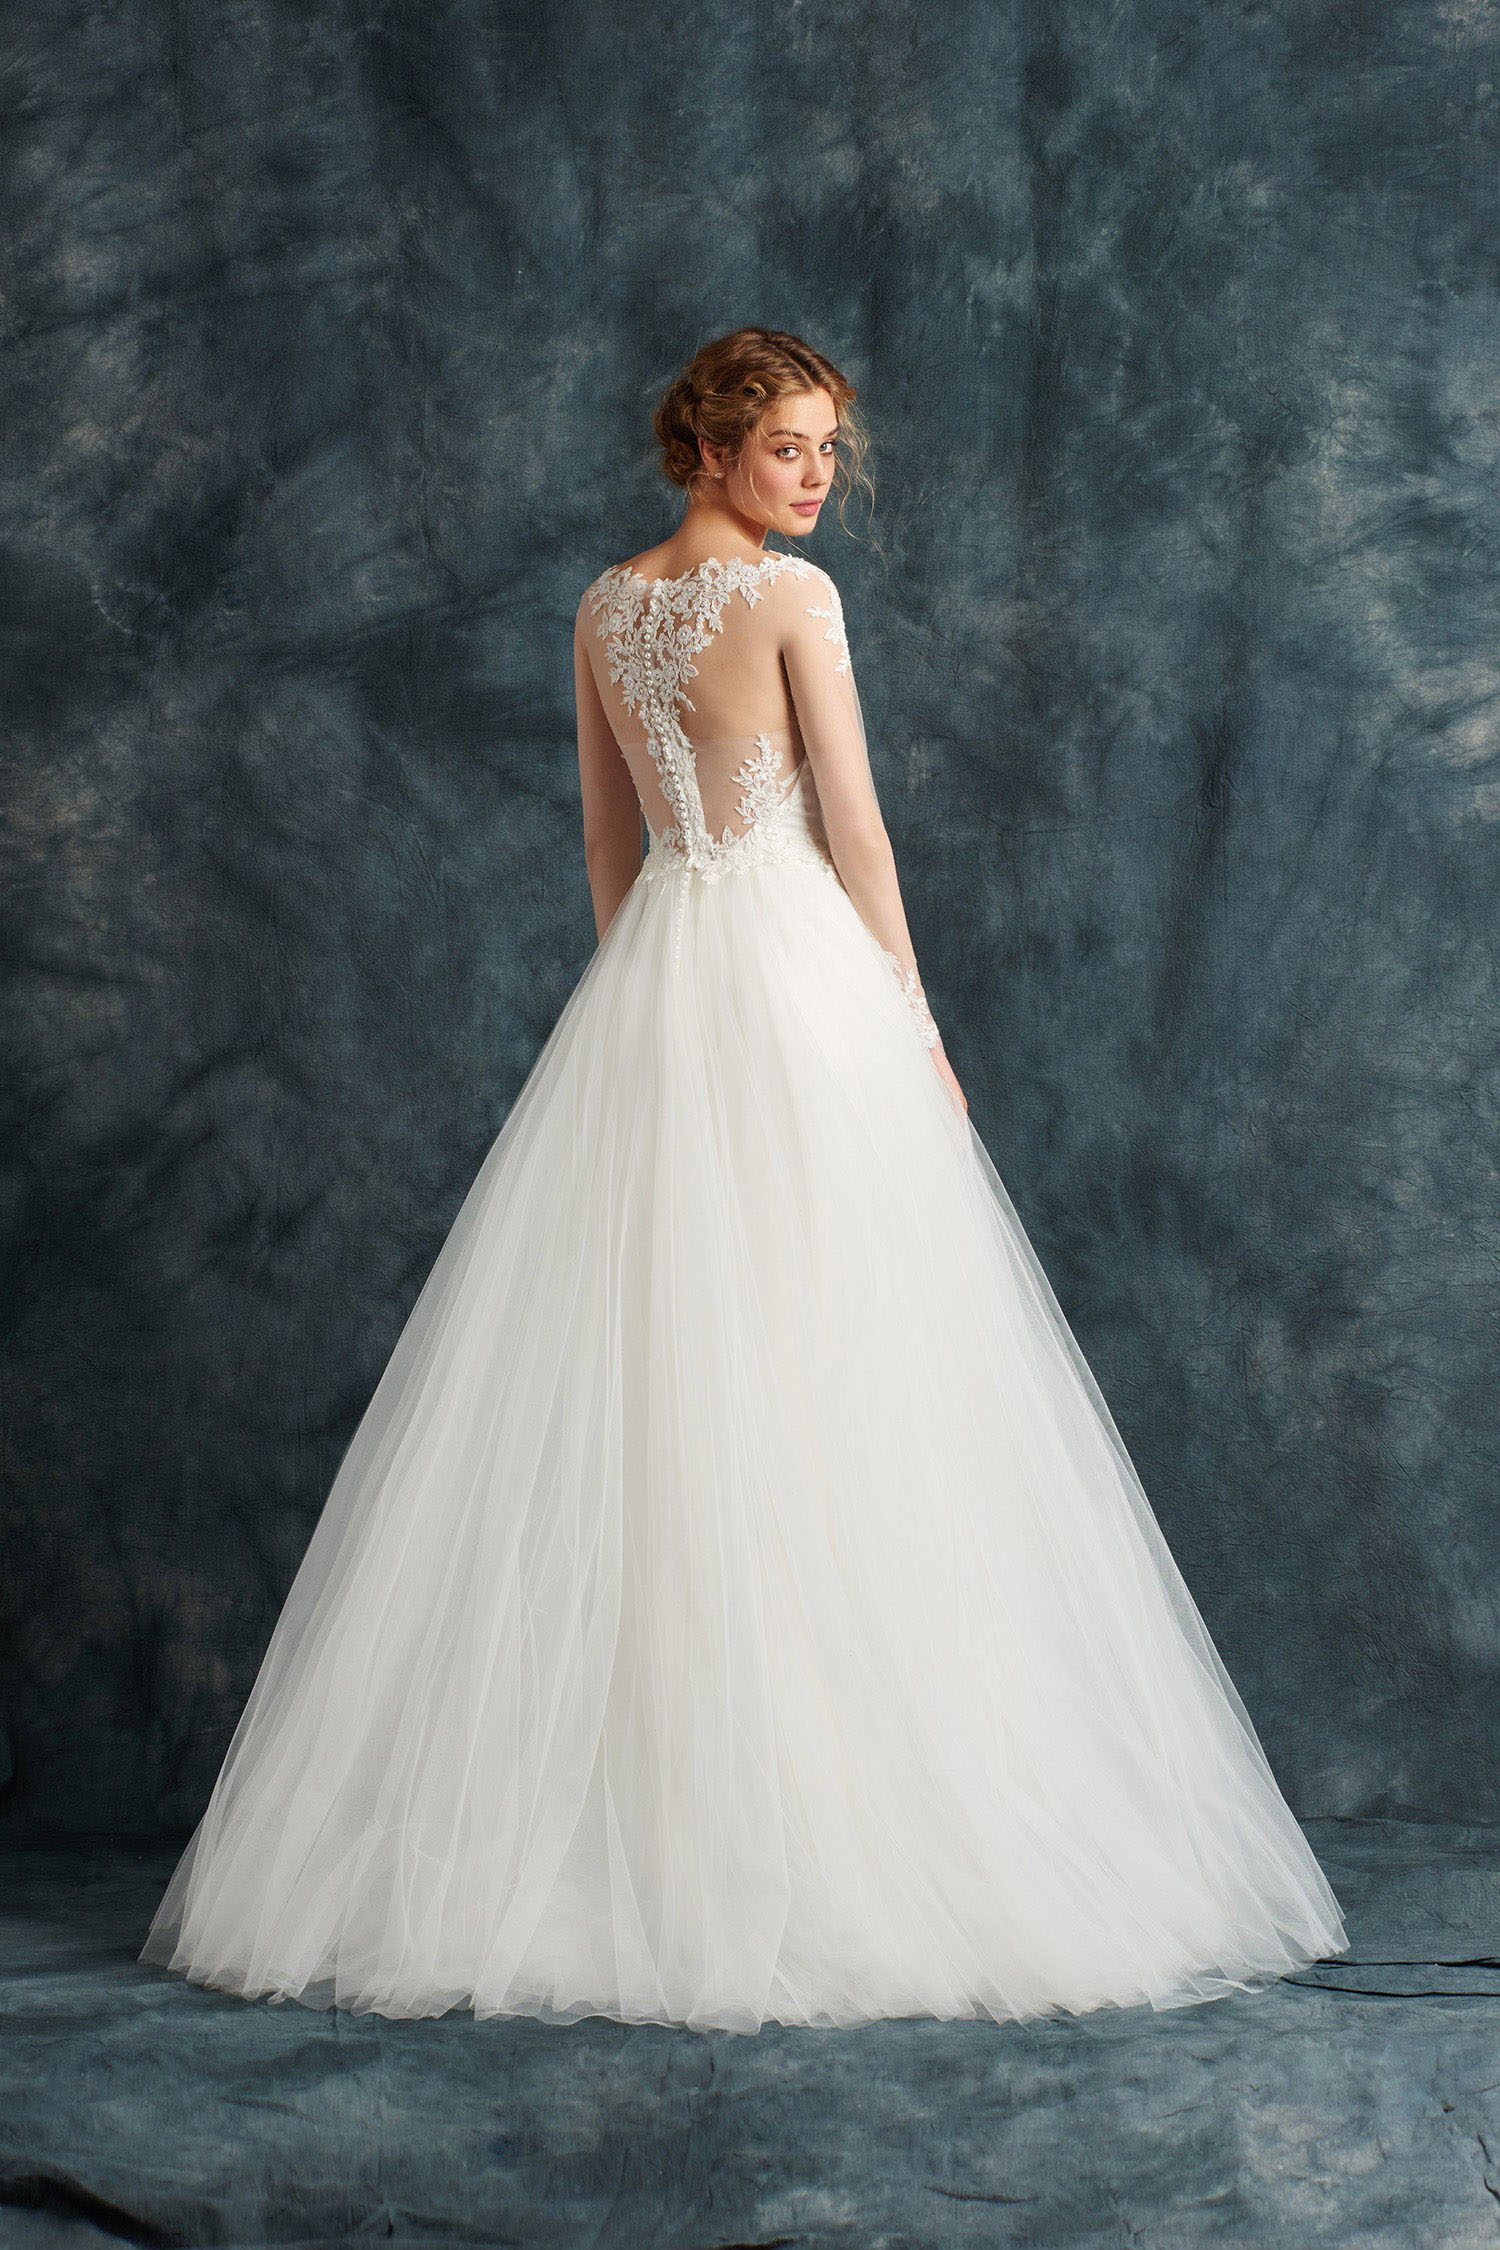 Cinderella wedding dress disney store  VANIAB  Wedding dress  Pinterest  Wedding dress and Weddings